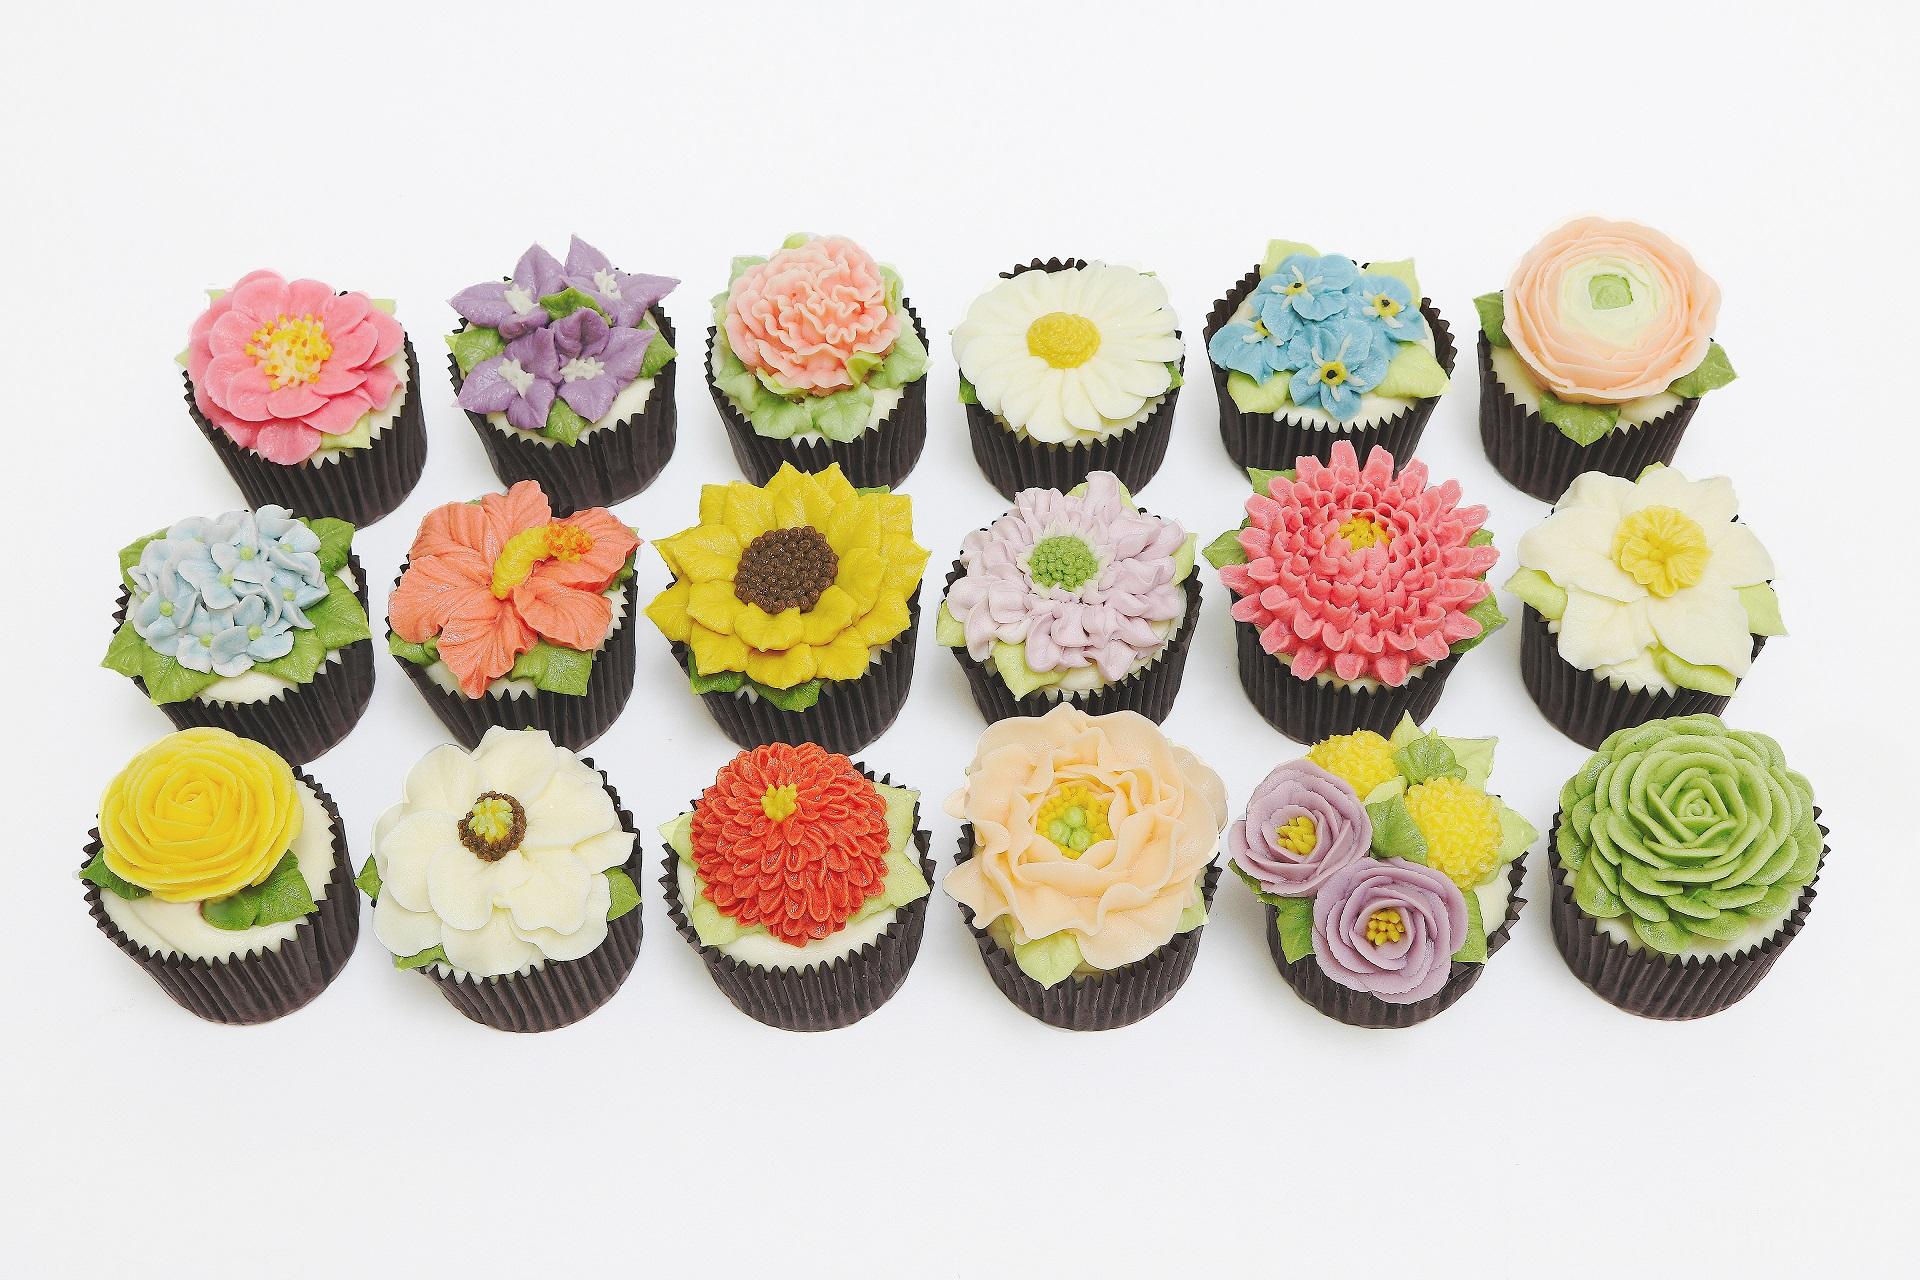 Floral Cupcakes Class 2